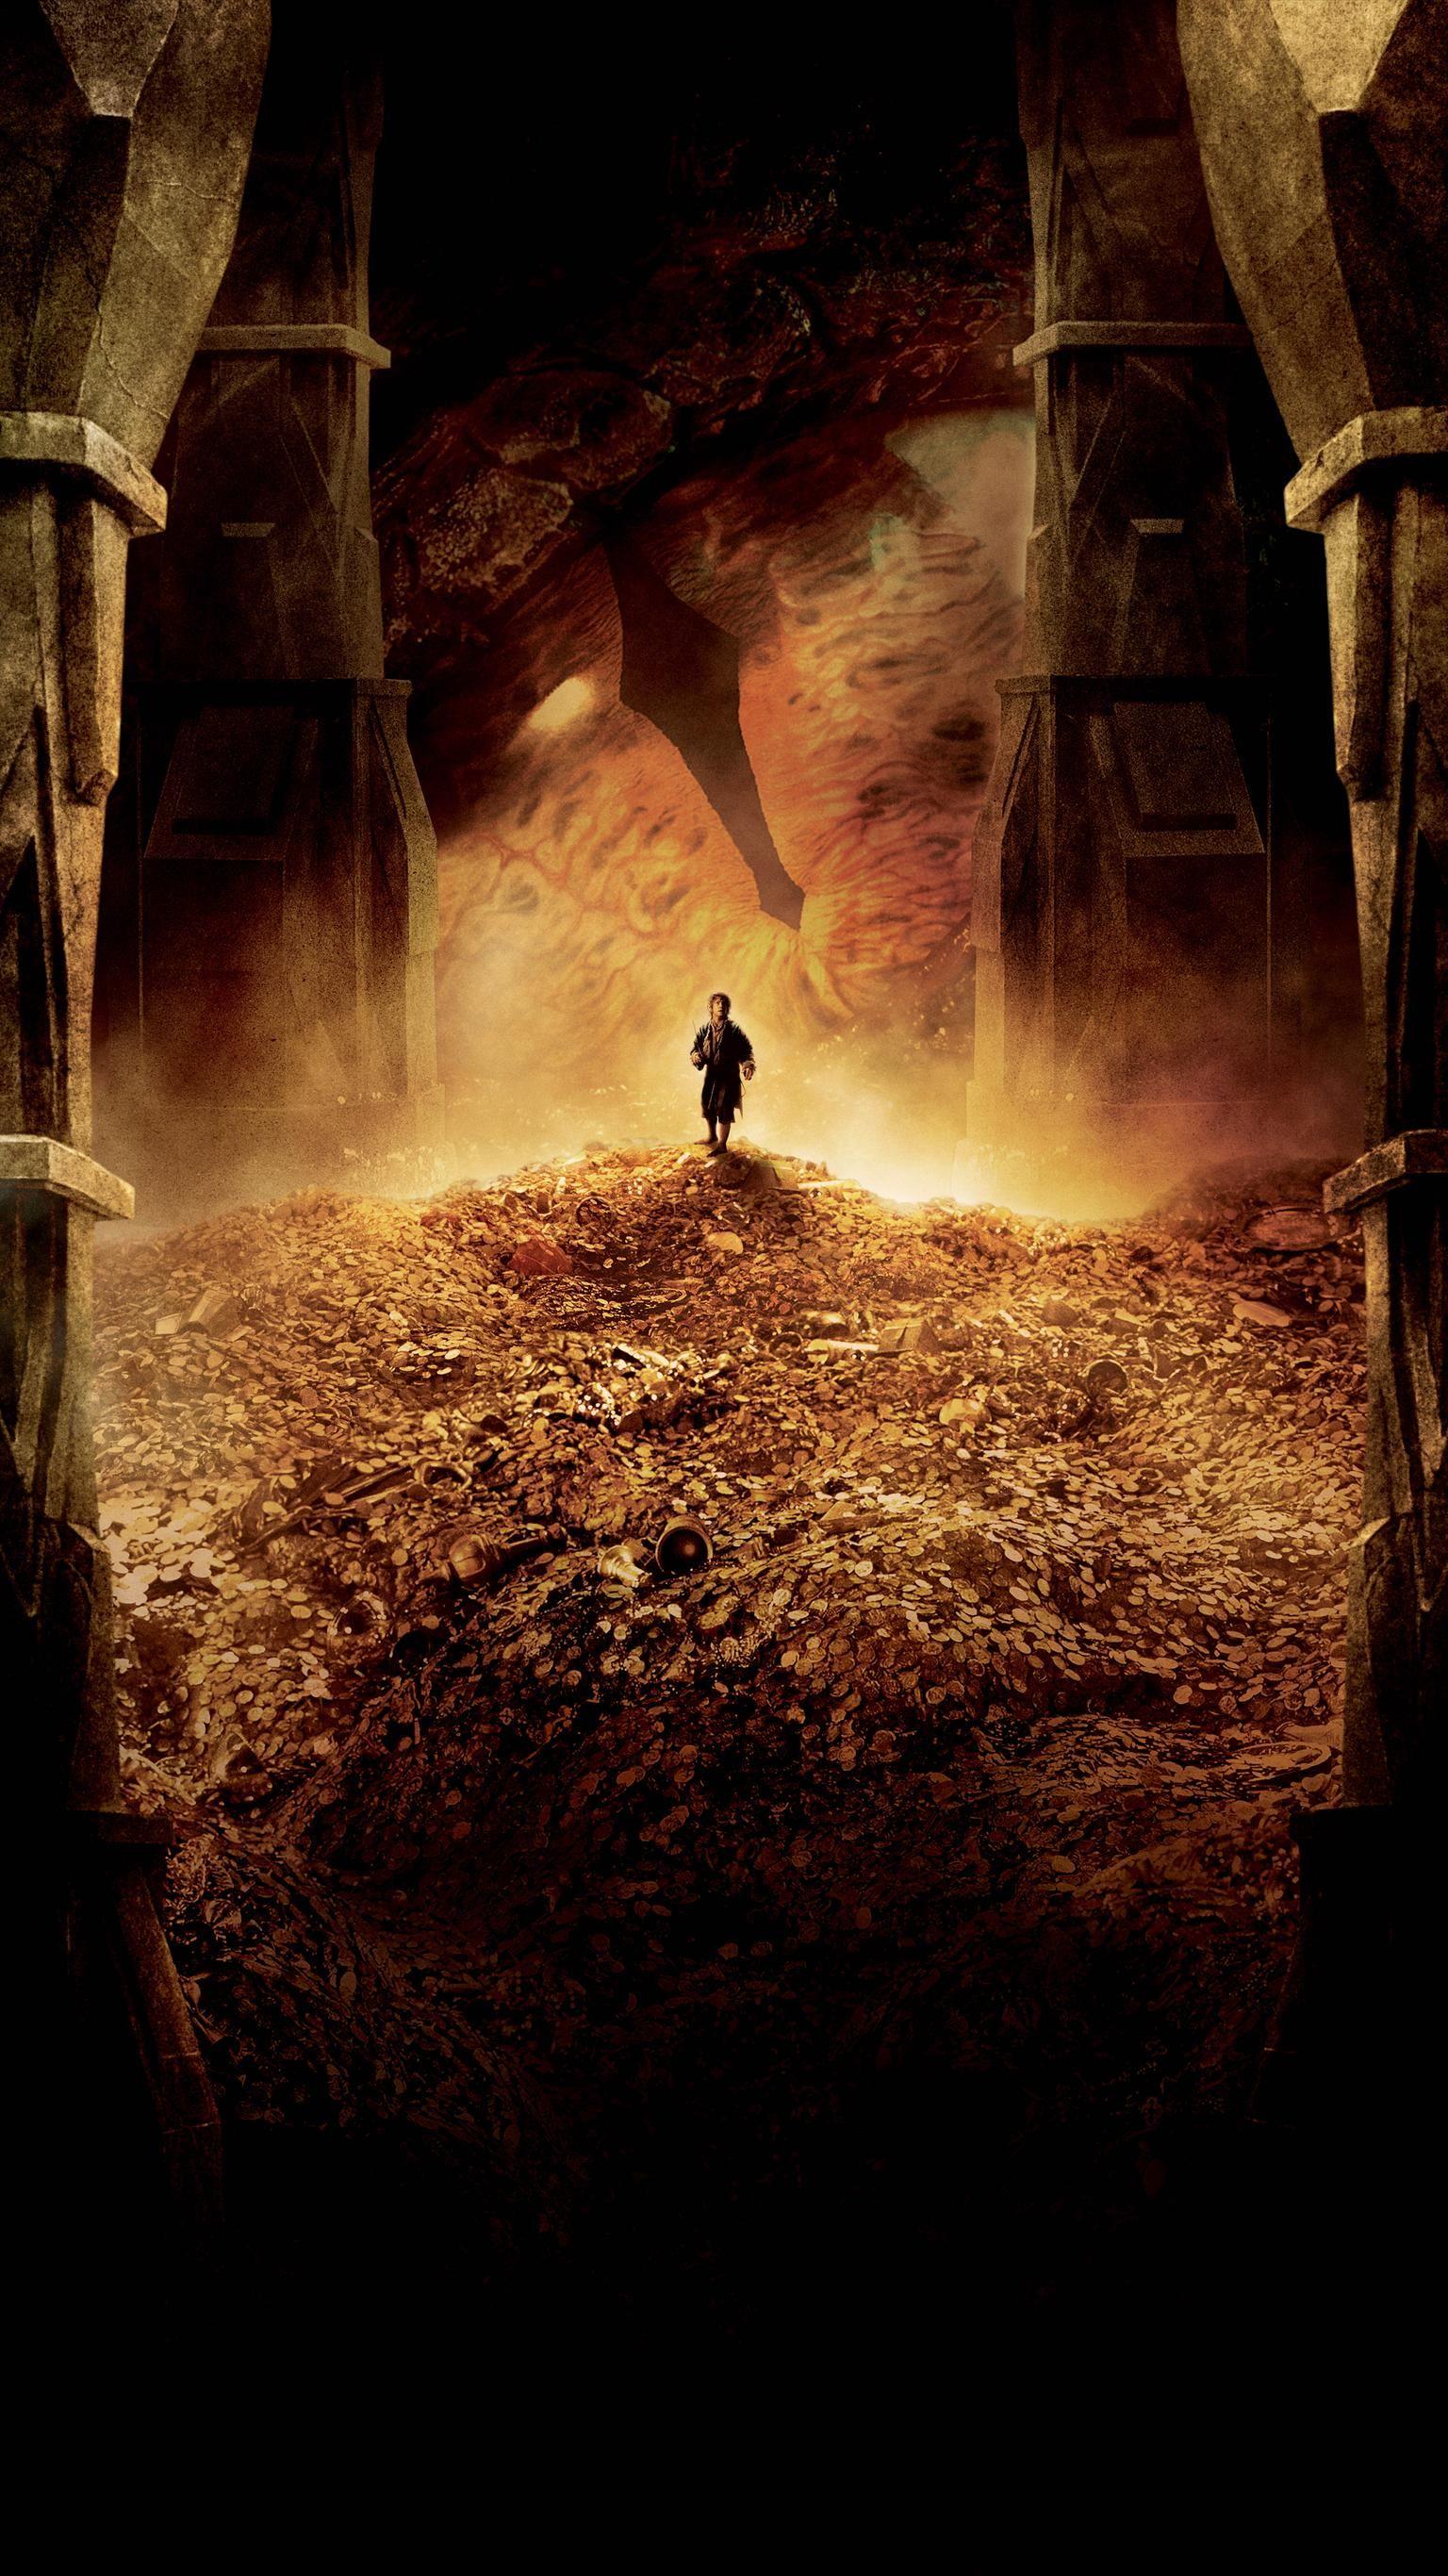 The Hobbit The Desolation Of Smaug 2013 Phone Wallpaper Moviemania Hobbit Desolation Of Smaug Desolation Of Smaug The Hobbit